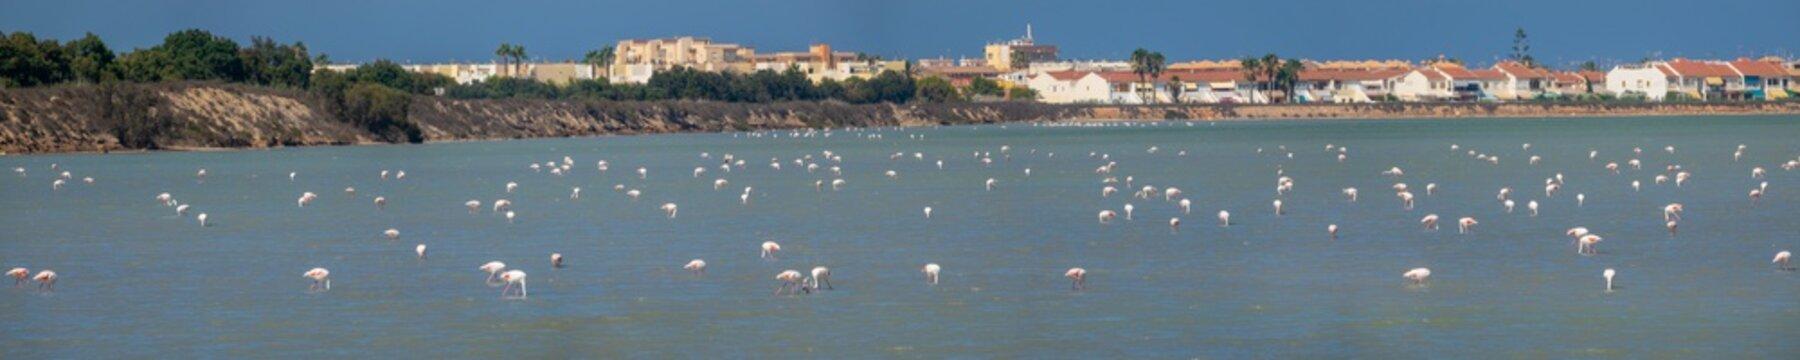 Flock of pink flamingos in the salt lake